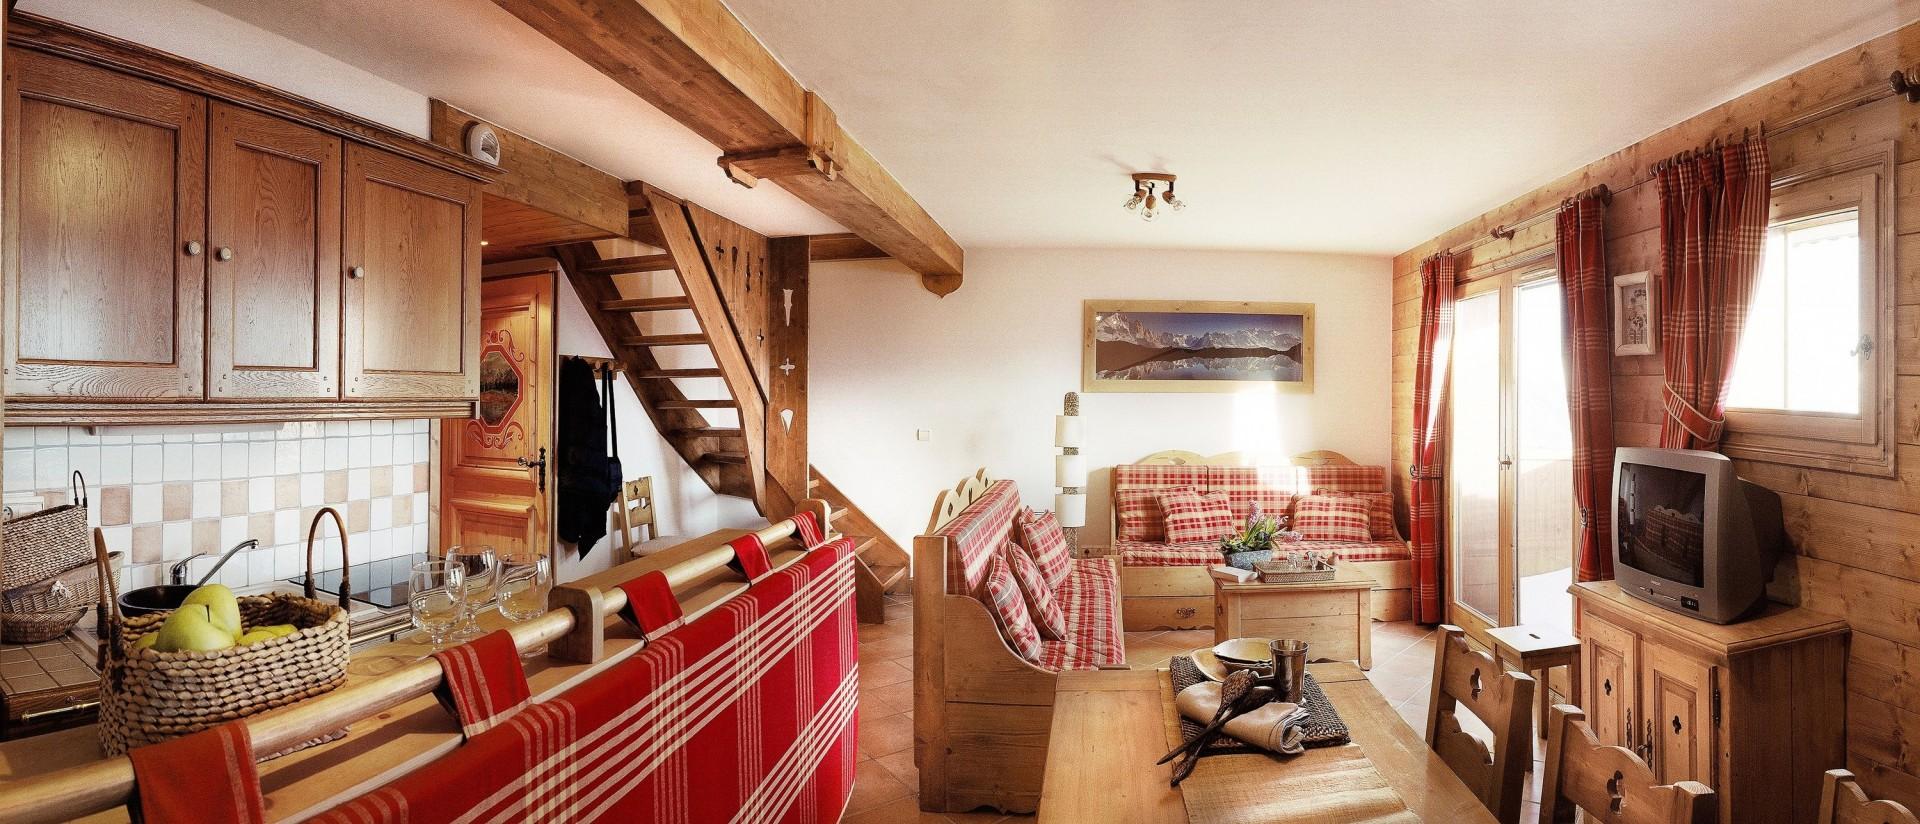 Champagny En Vanoise Location Appartement Luxe Chapminice Salon